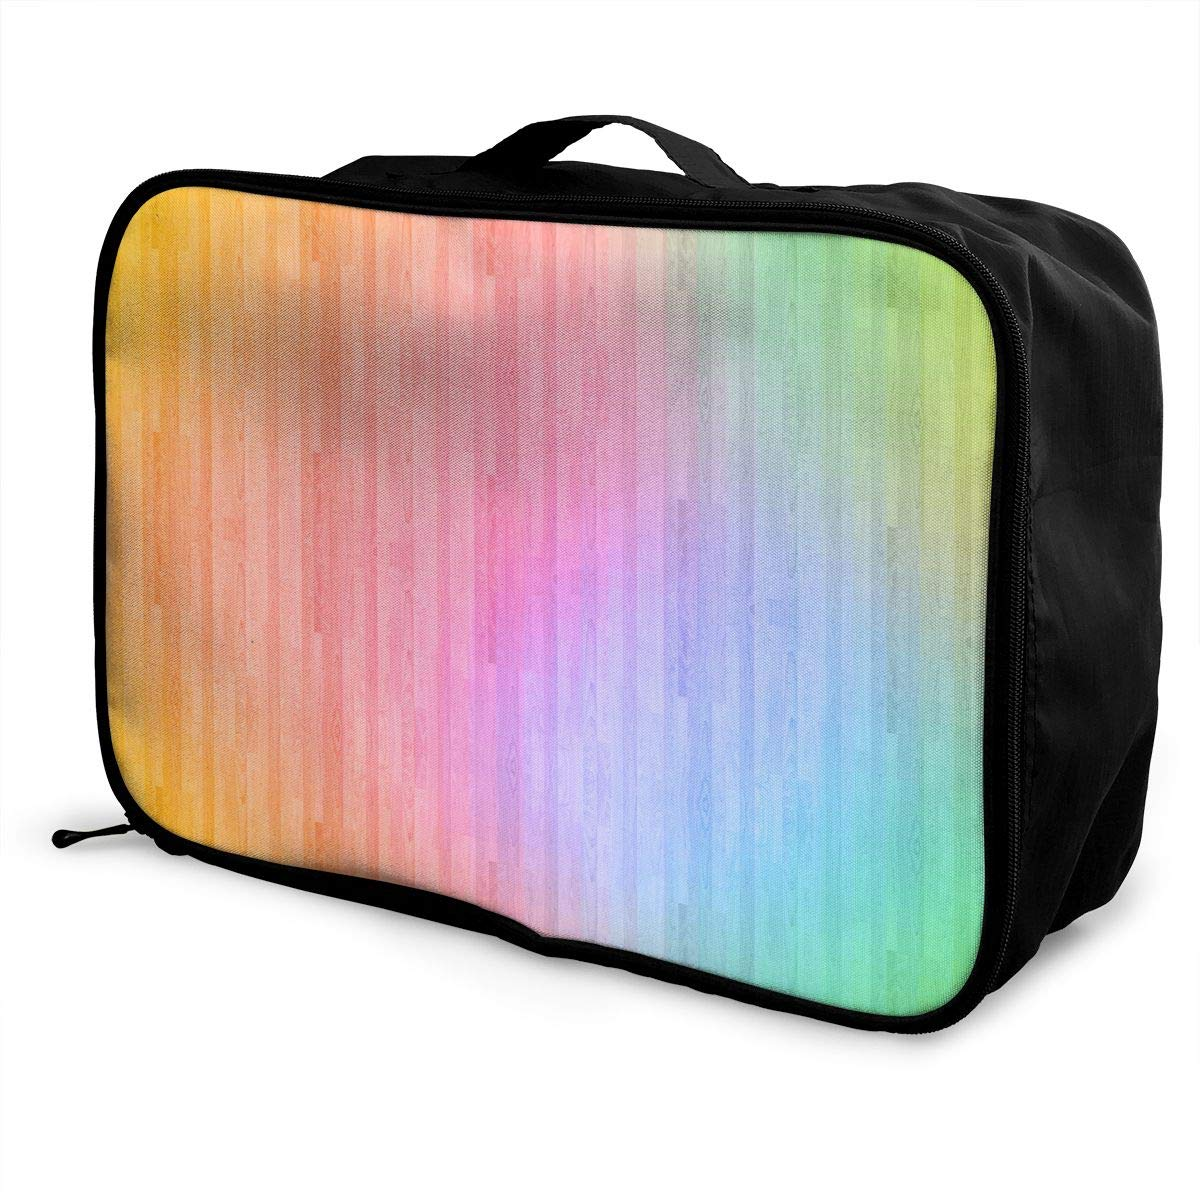 YueLJB Pastel Rainbow Pretty Lightweight Large Capacity Portable Luggage Bag Travel Duffel Bag Storage Carry Luggage Duffle Tote Bag